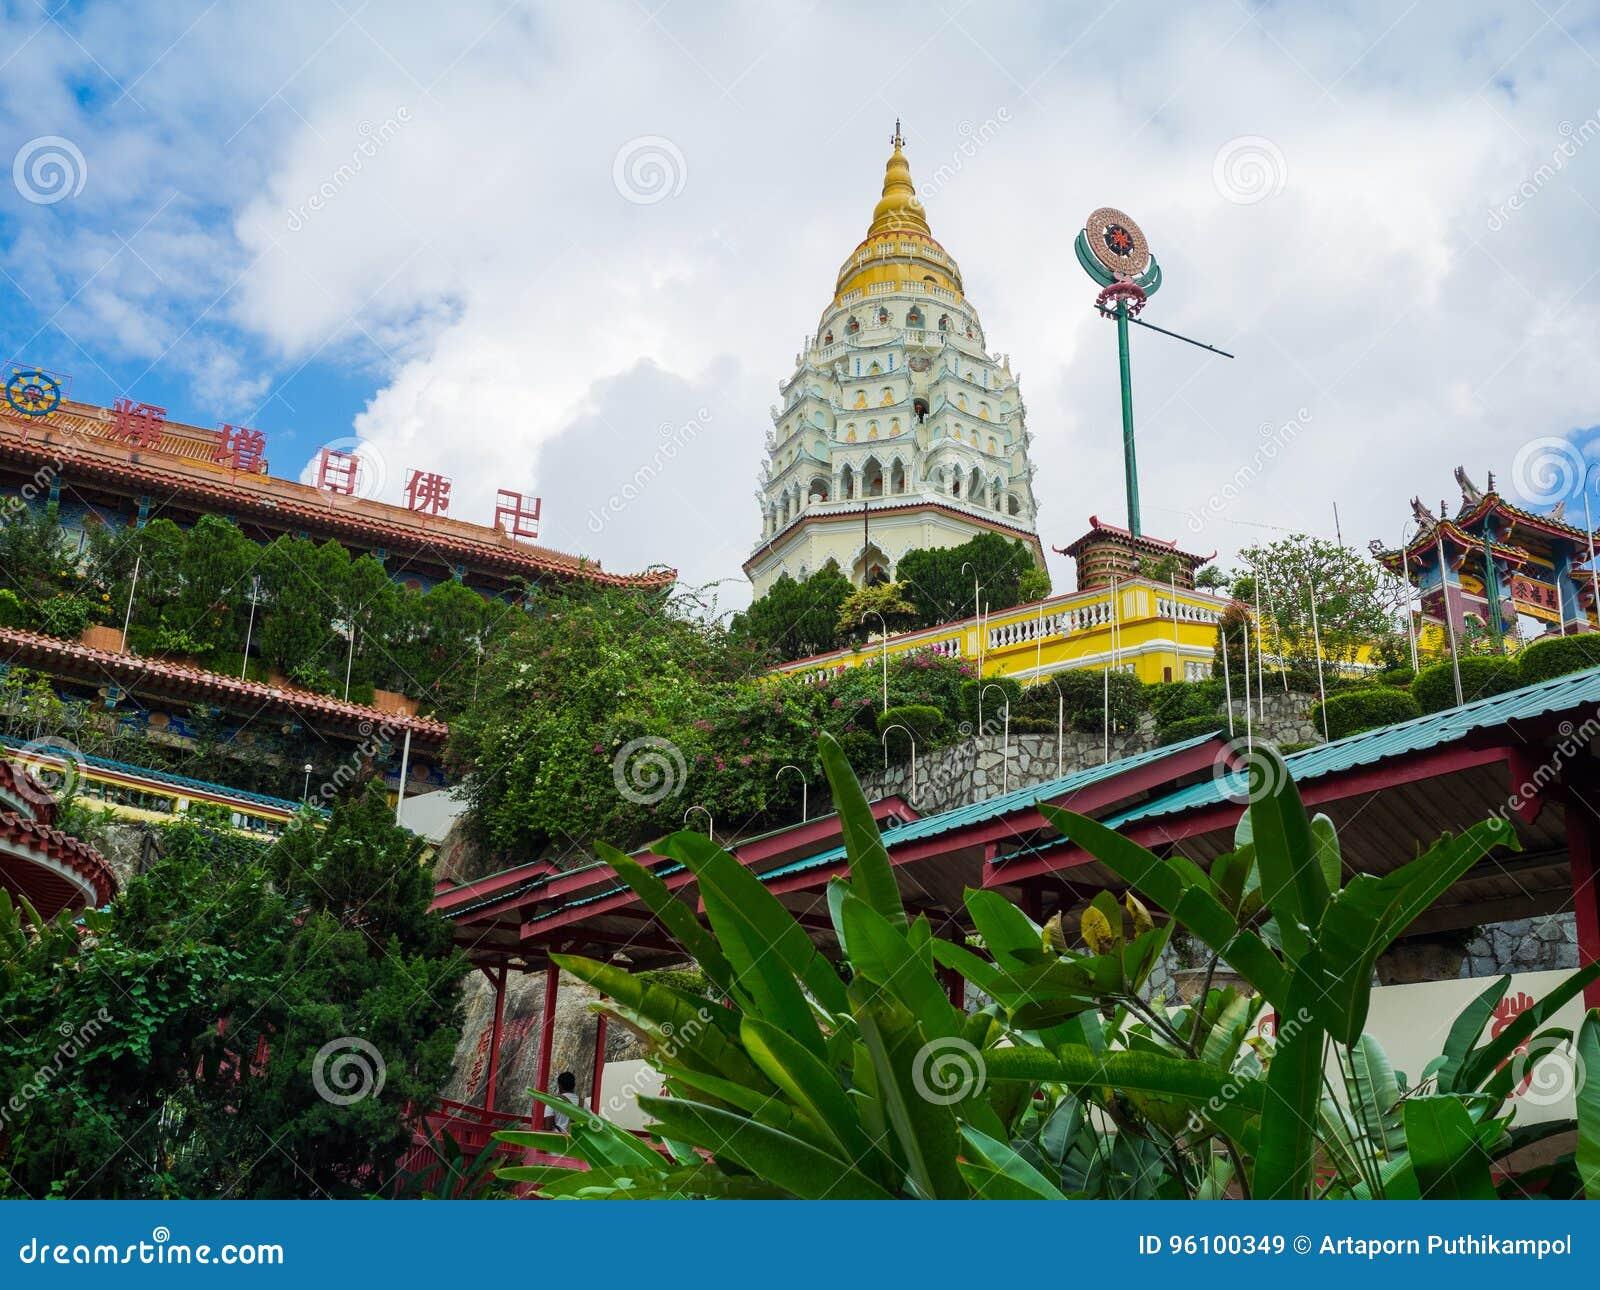 Kek Lok Si Temple en Georgetown, Penang, Malasia